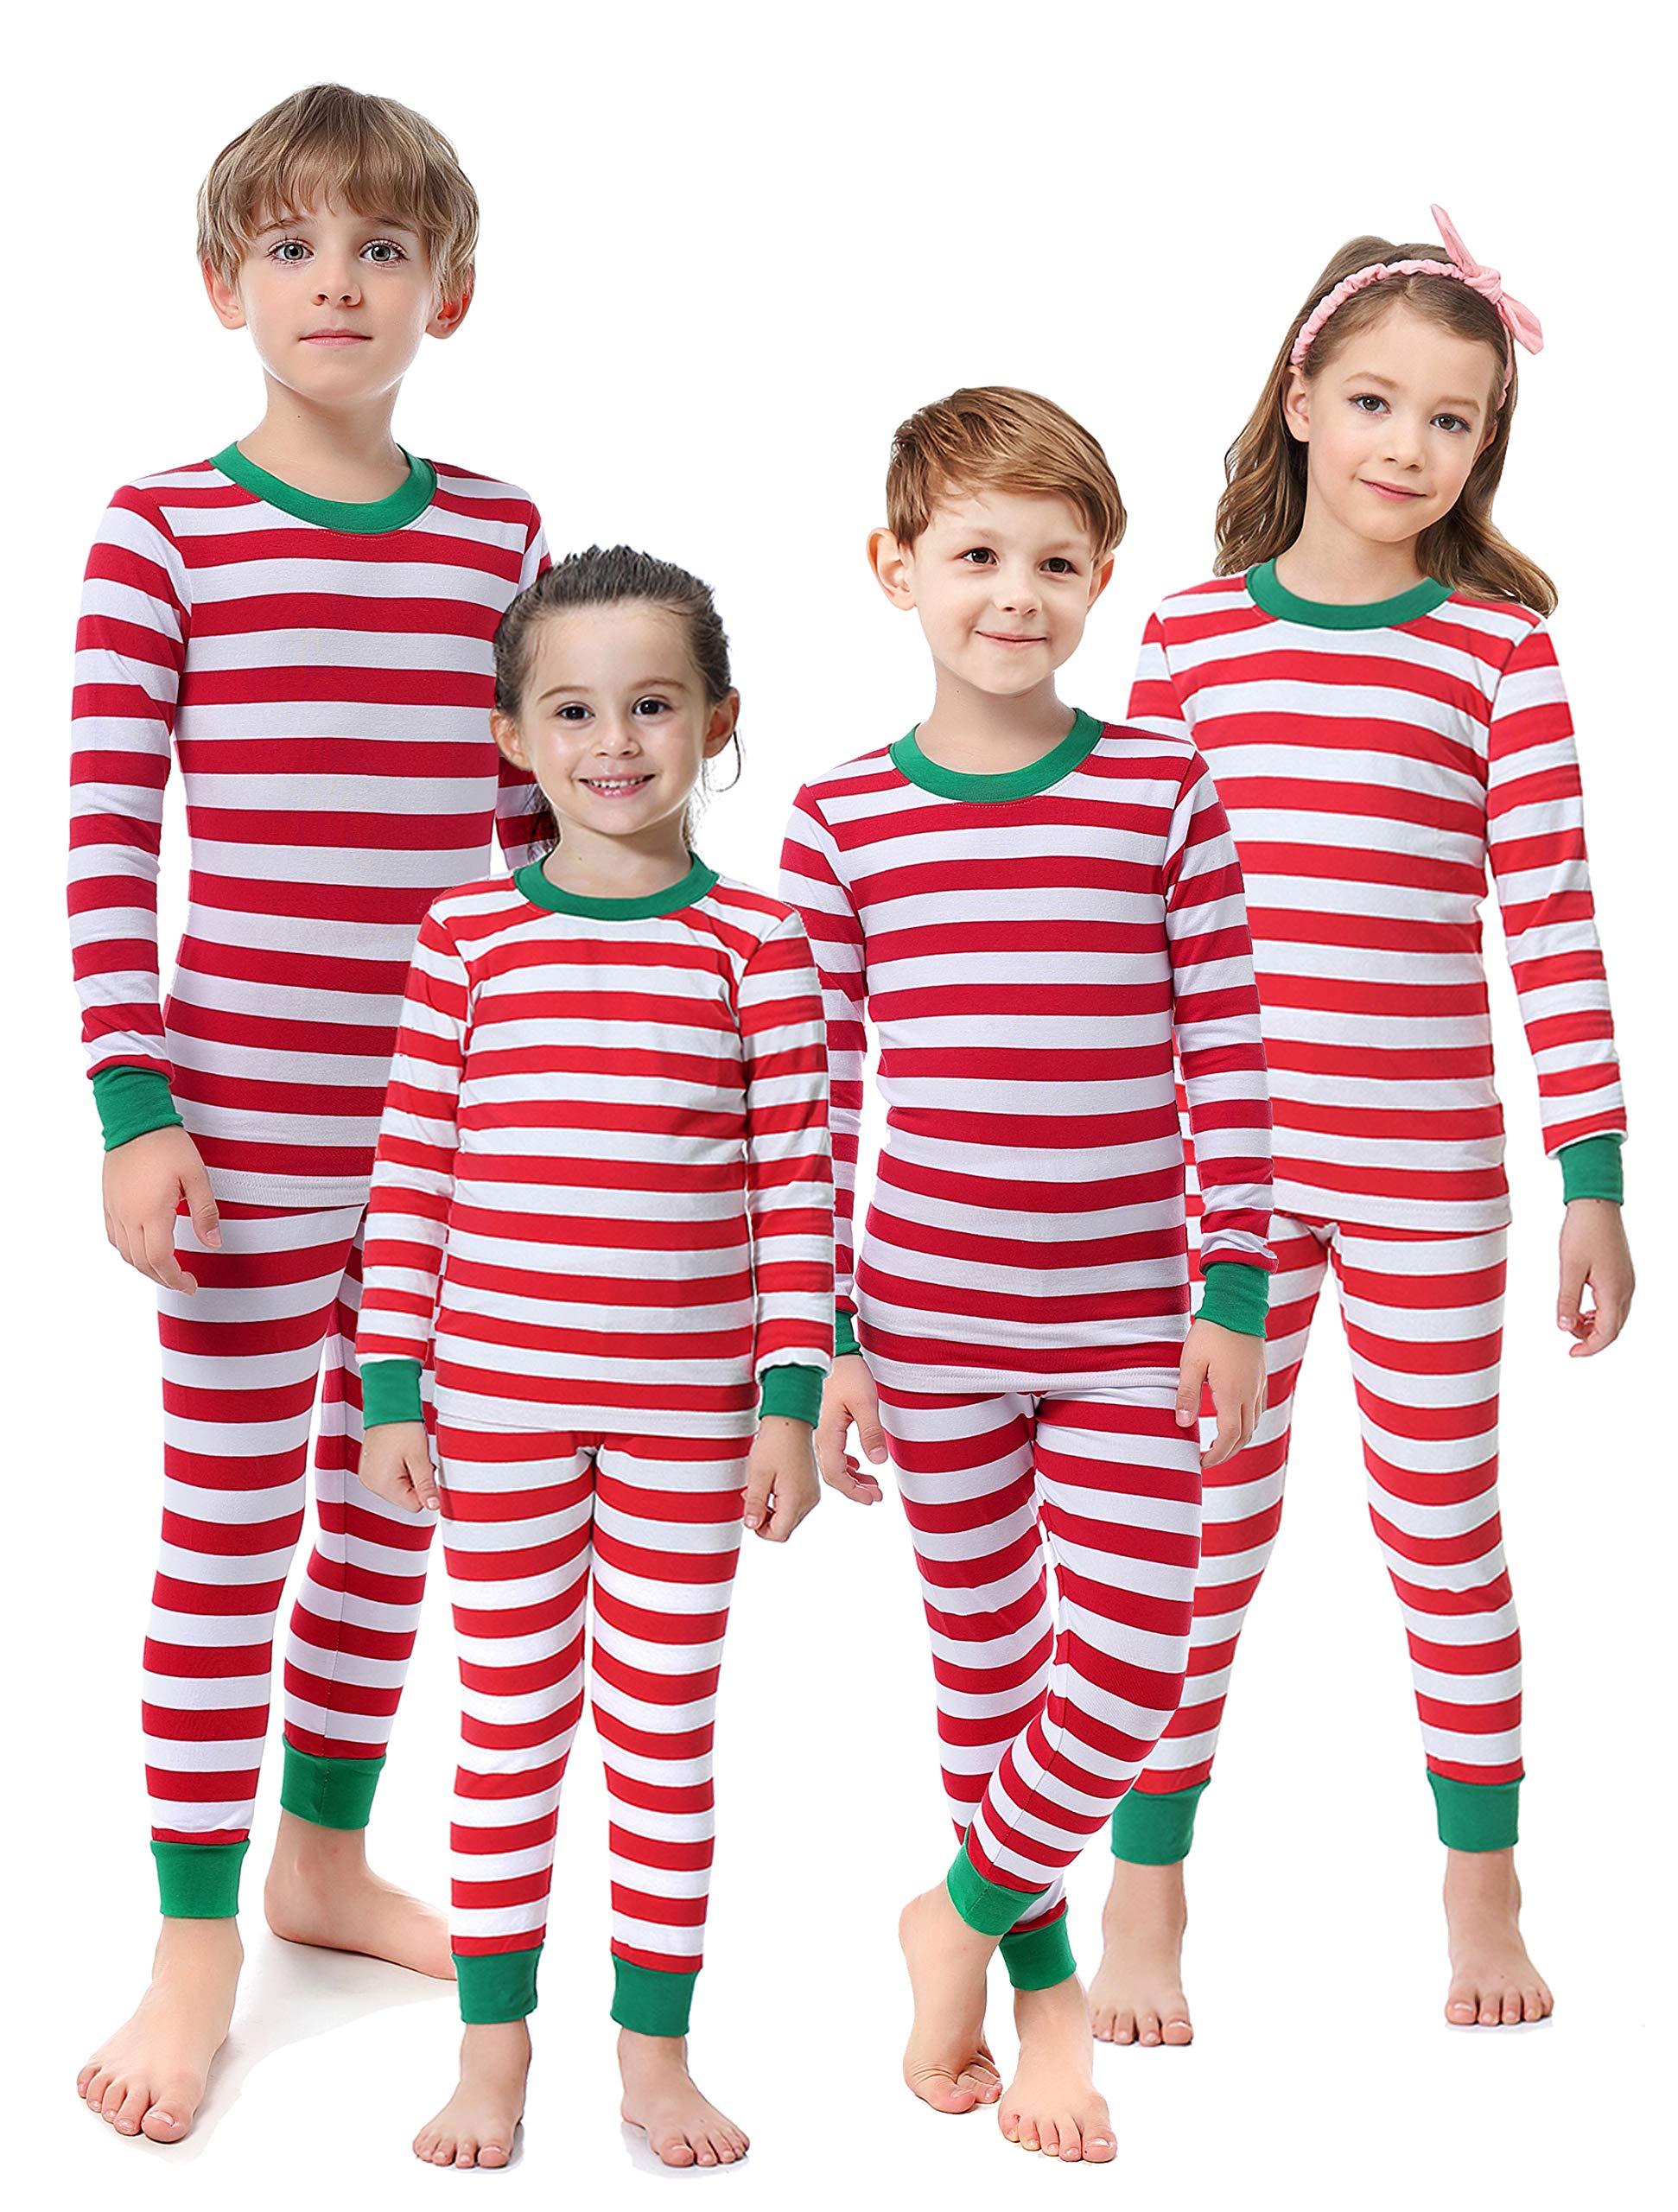 shelry Matching Family Christmas Boys Girls Pajamas Striped Kids Sleepwear  Children Clothes 4c98d0b5f